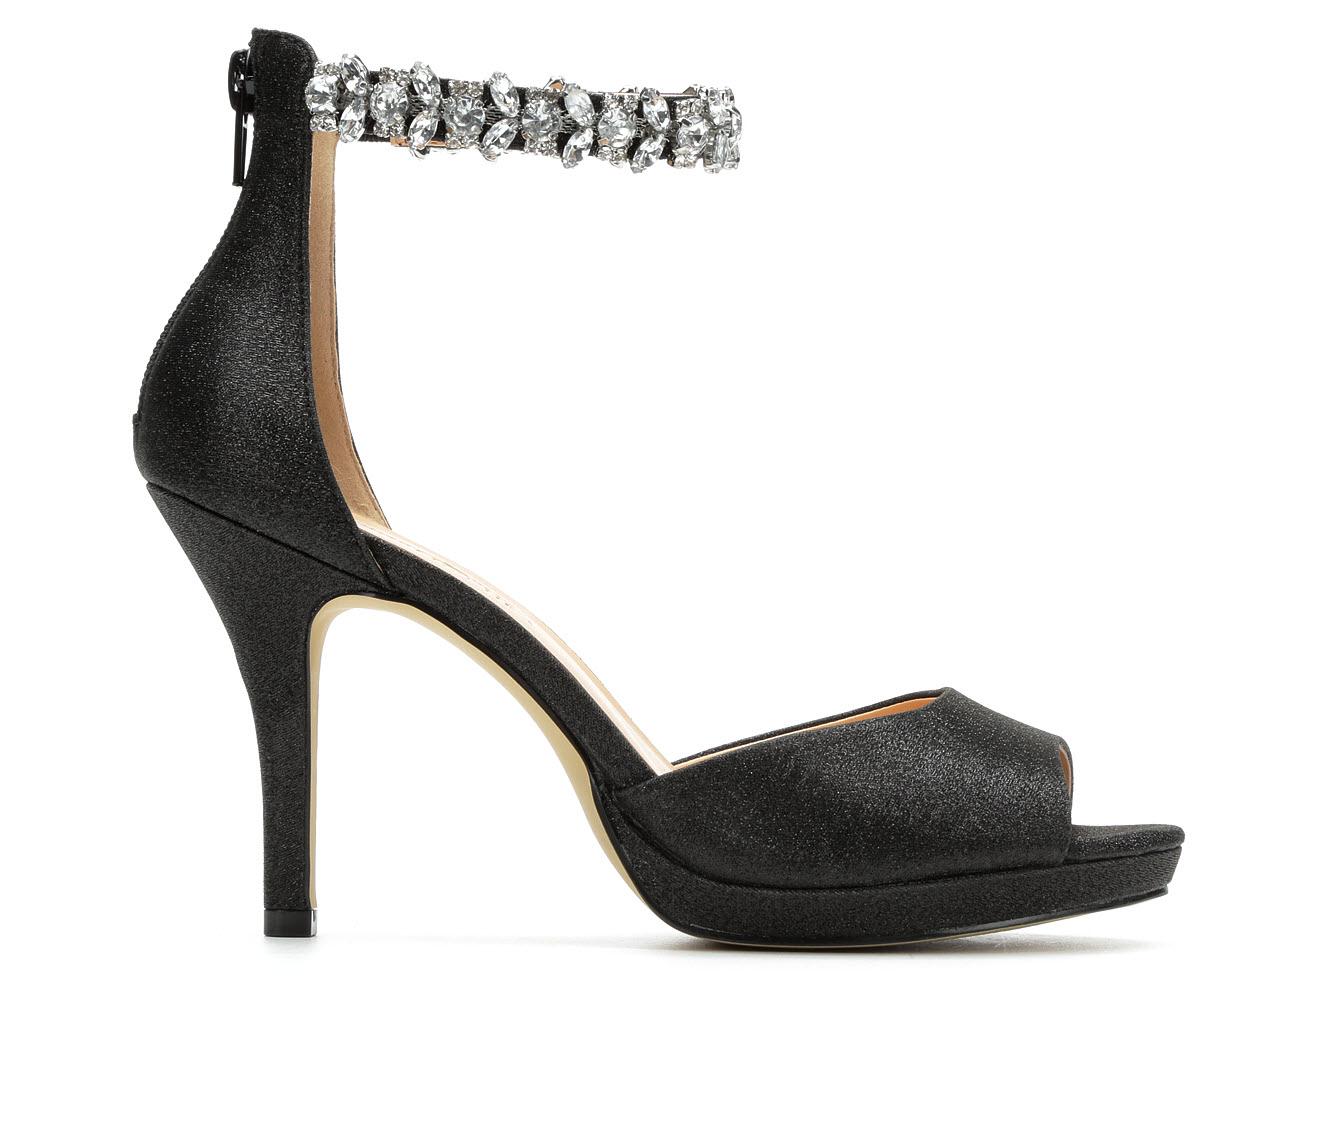 American Glamour BadgleyM Ximena Women's Dress Shoe (Black Canvas)